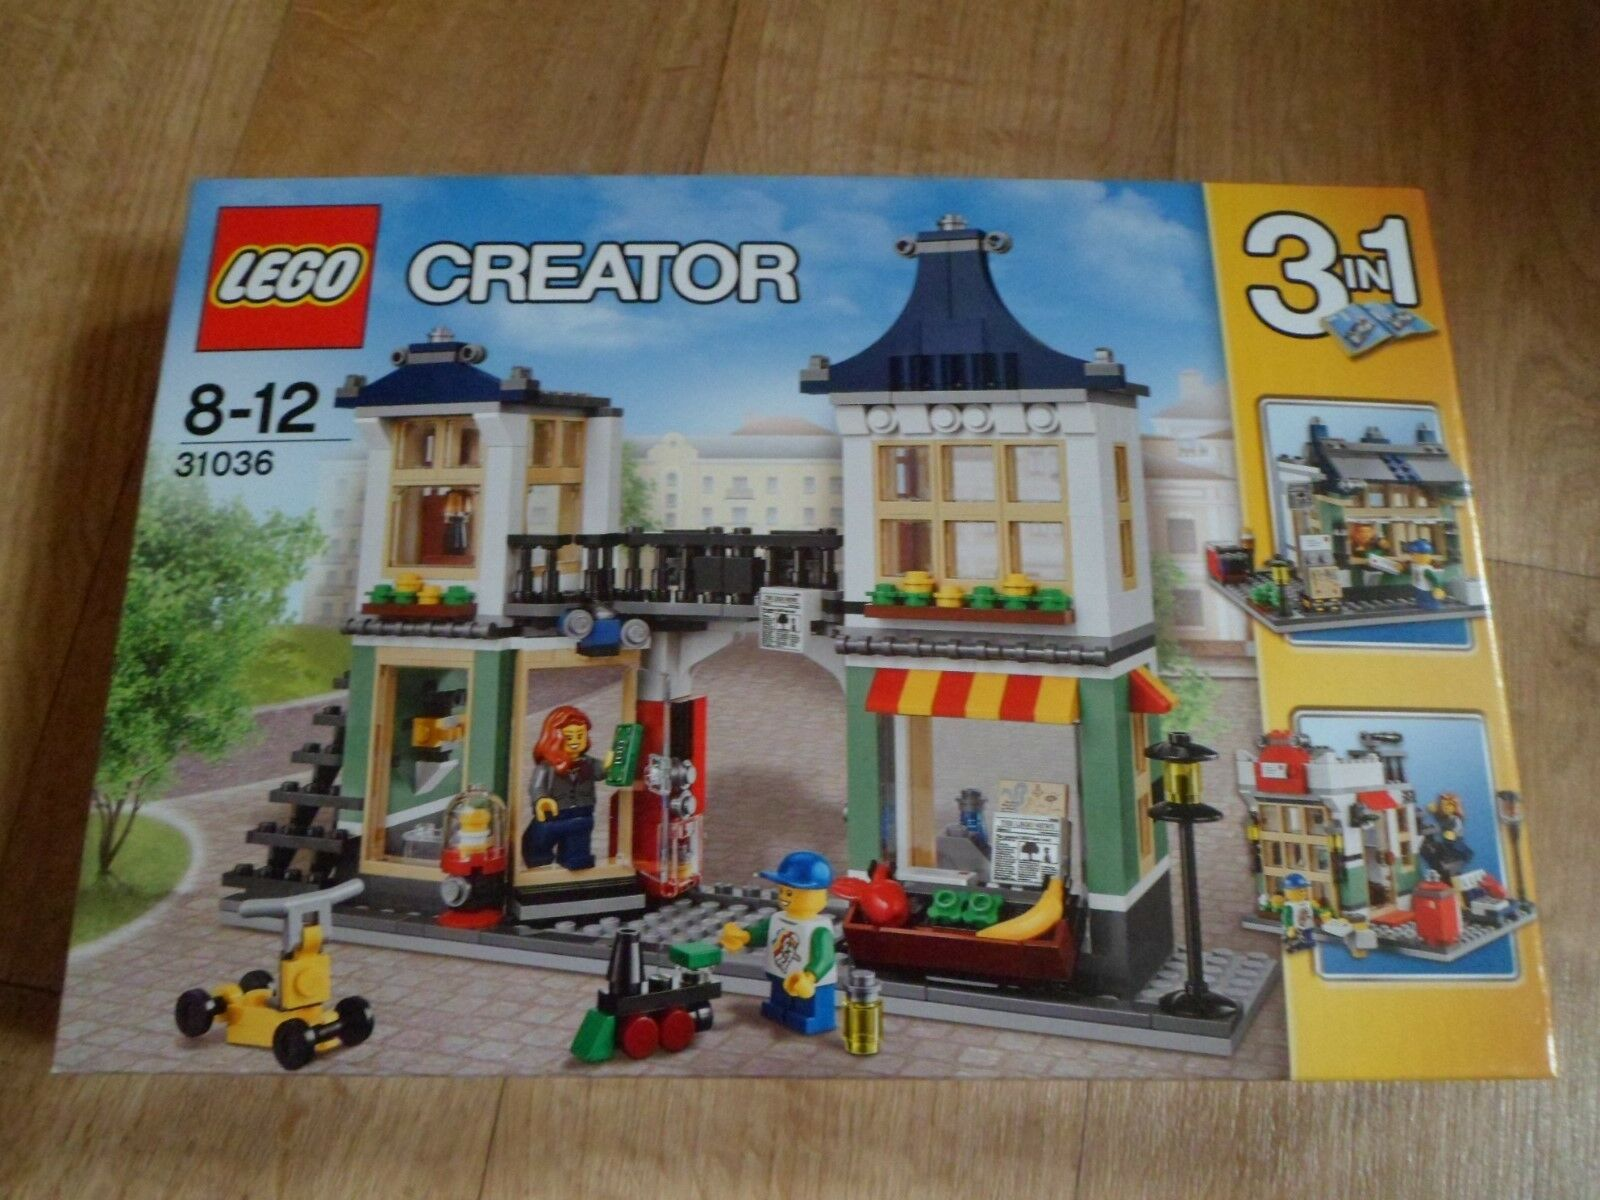 LEGO Creator Toy & Grocery Shop 3 in 1 - set 31036 BNIB new sealed box building